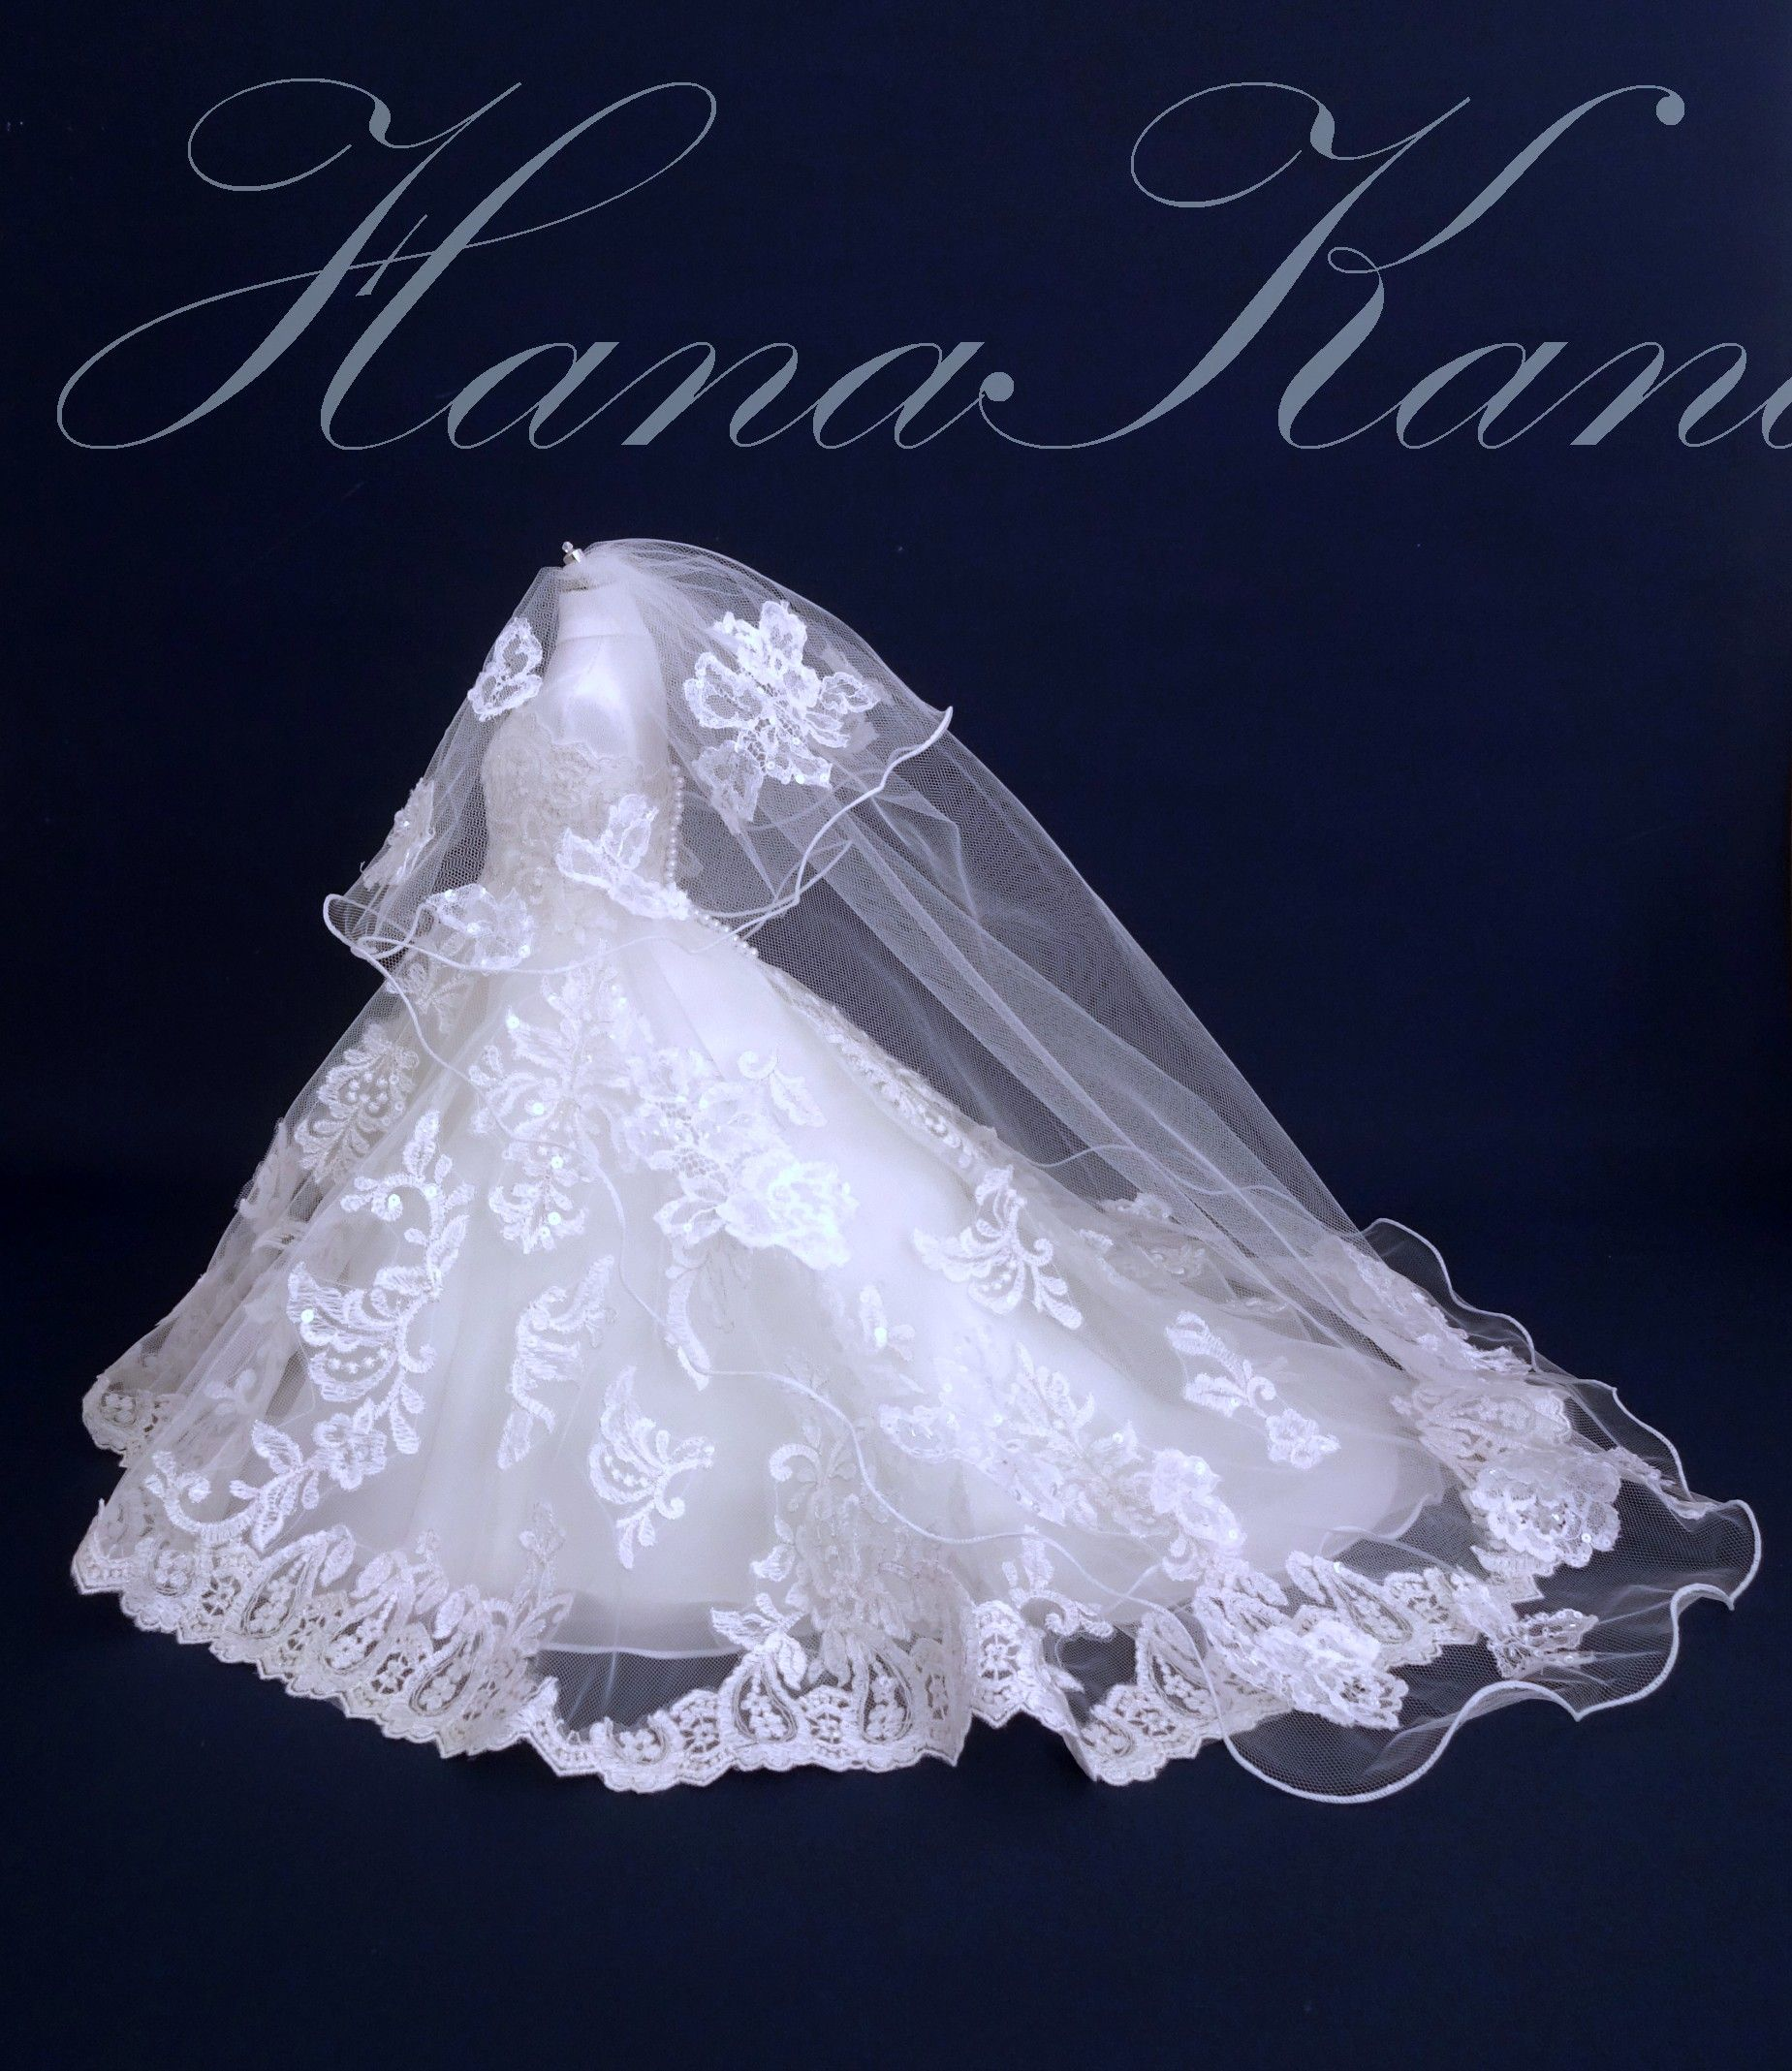 Hanakanadress ウエディングドレスからミニチュアドレスへリメイクしました ウエディングドレスリメイク ミニチュアドール ミニドレス ミニチュアベールドレス ミニチュアウエディングドレス 細部まで再現 ジオラマ ウエディングドール フラワーガールドレス